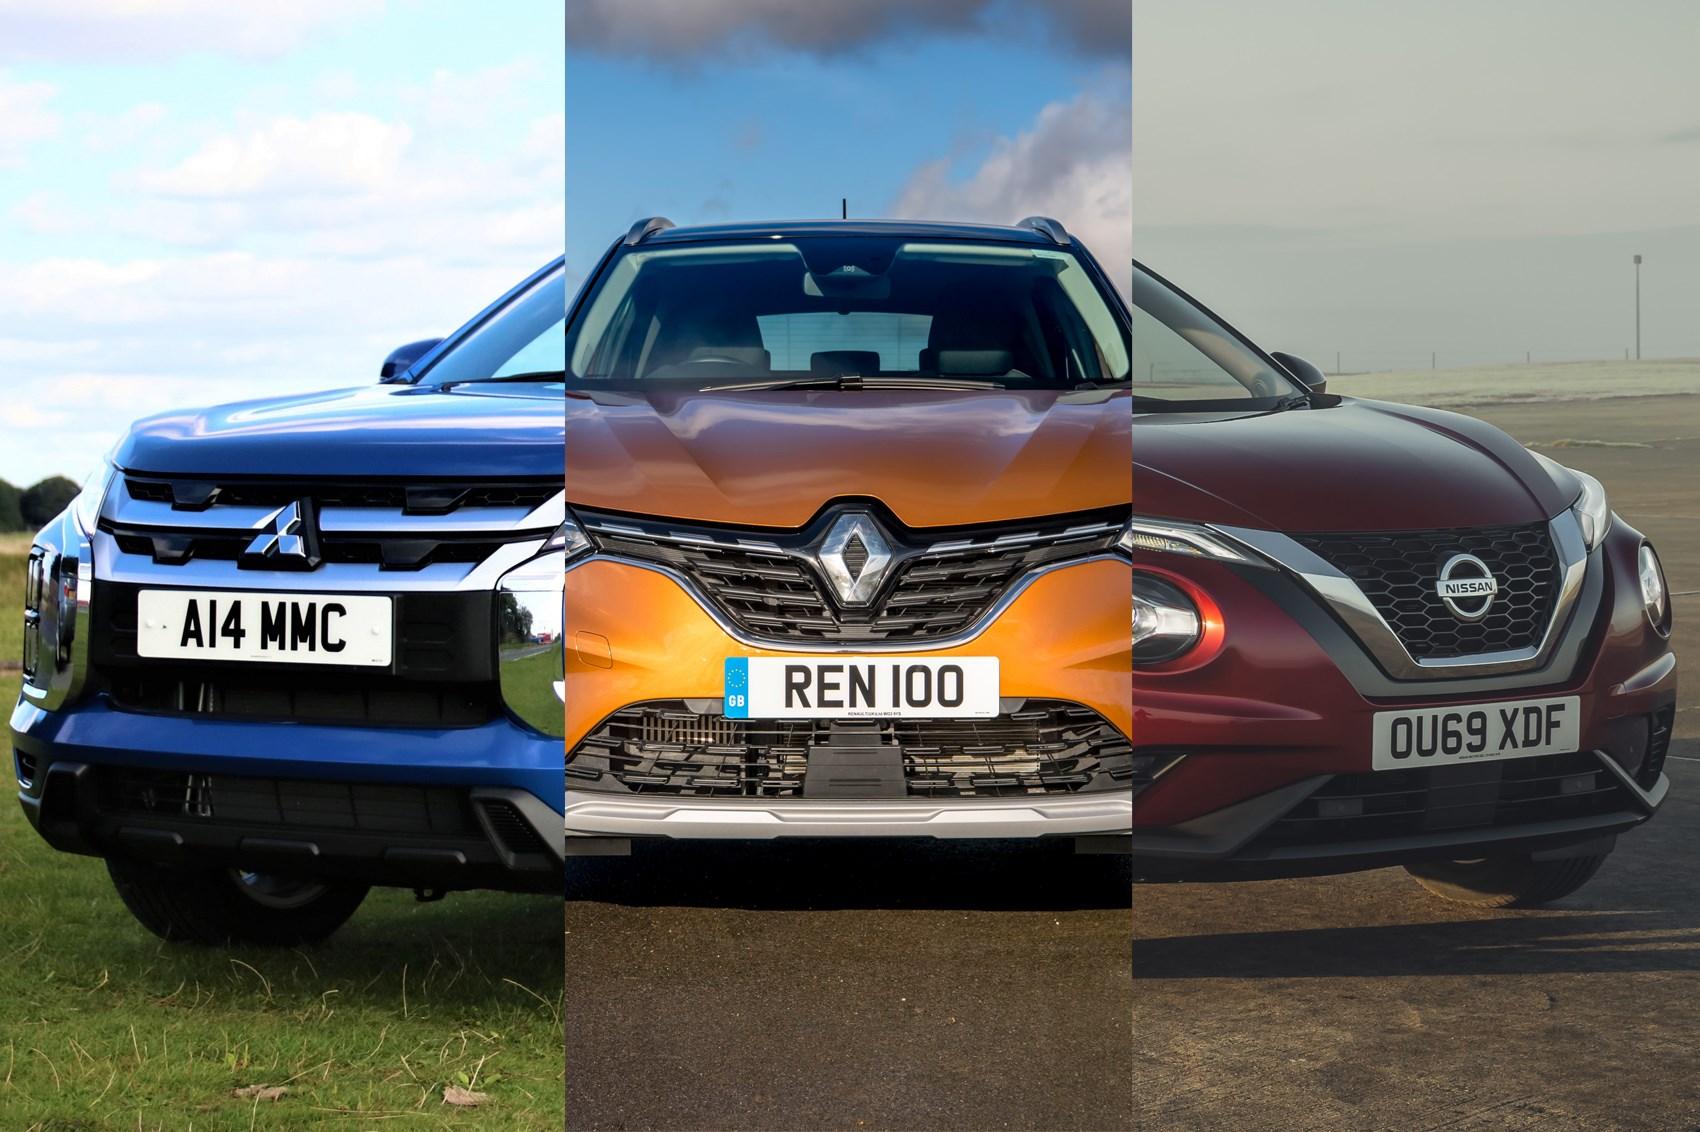 Renault, Nissan deepen cooperation in bid for survival